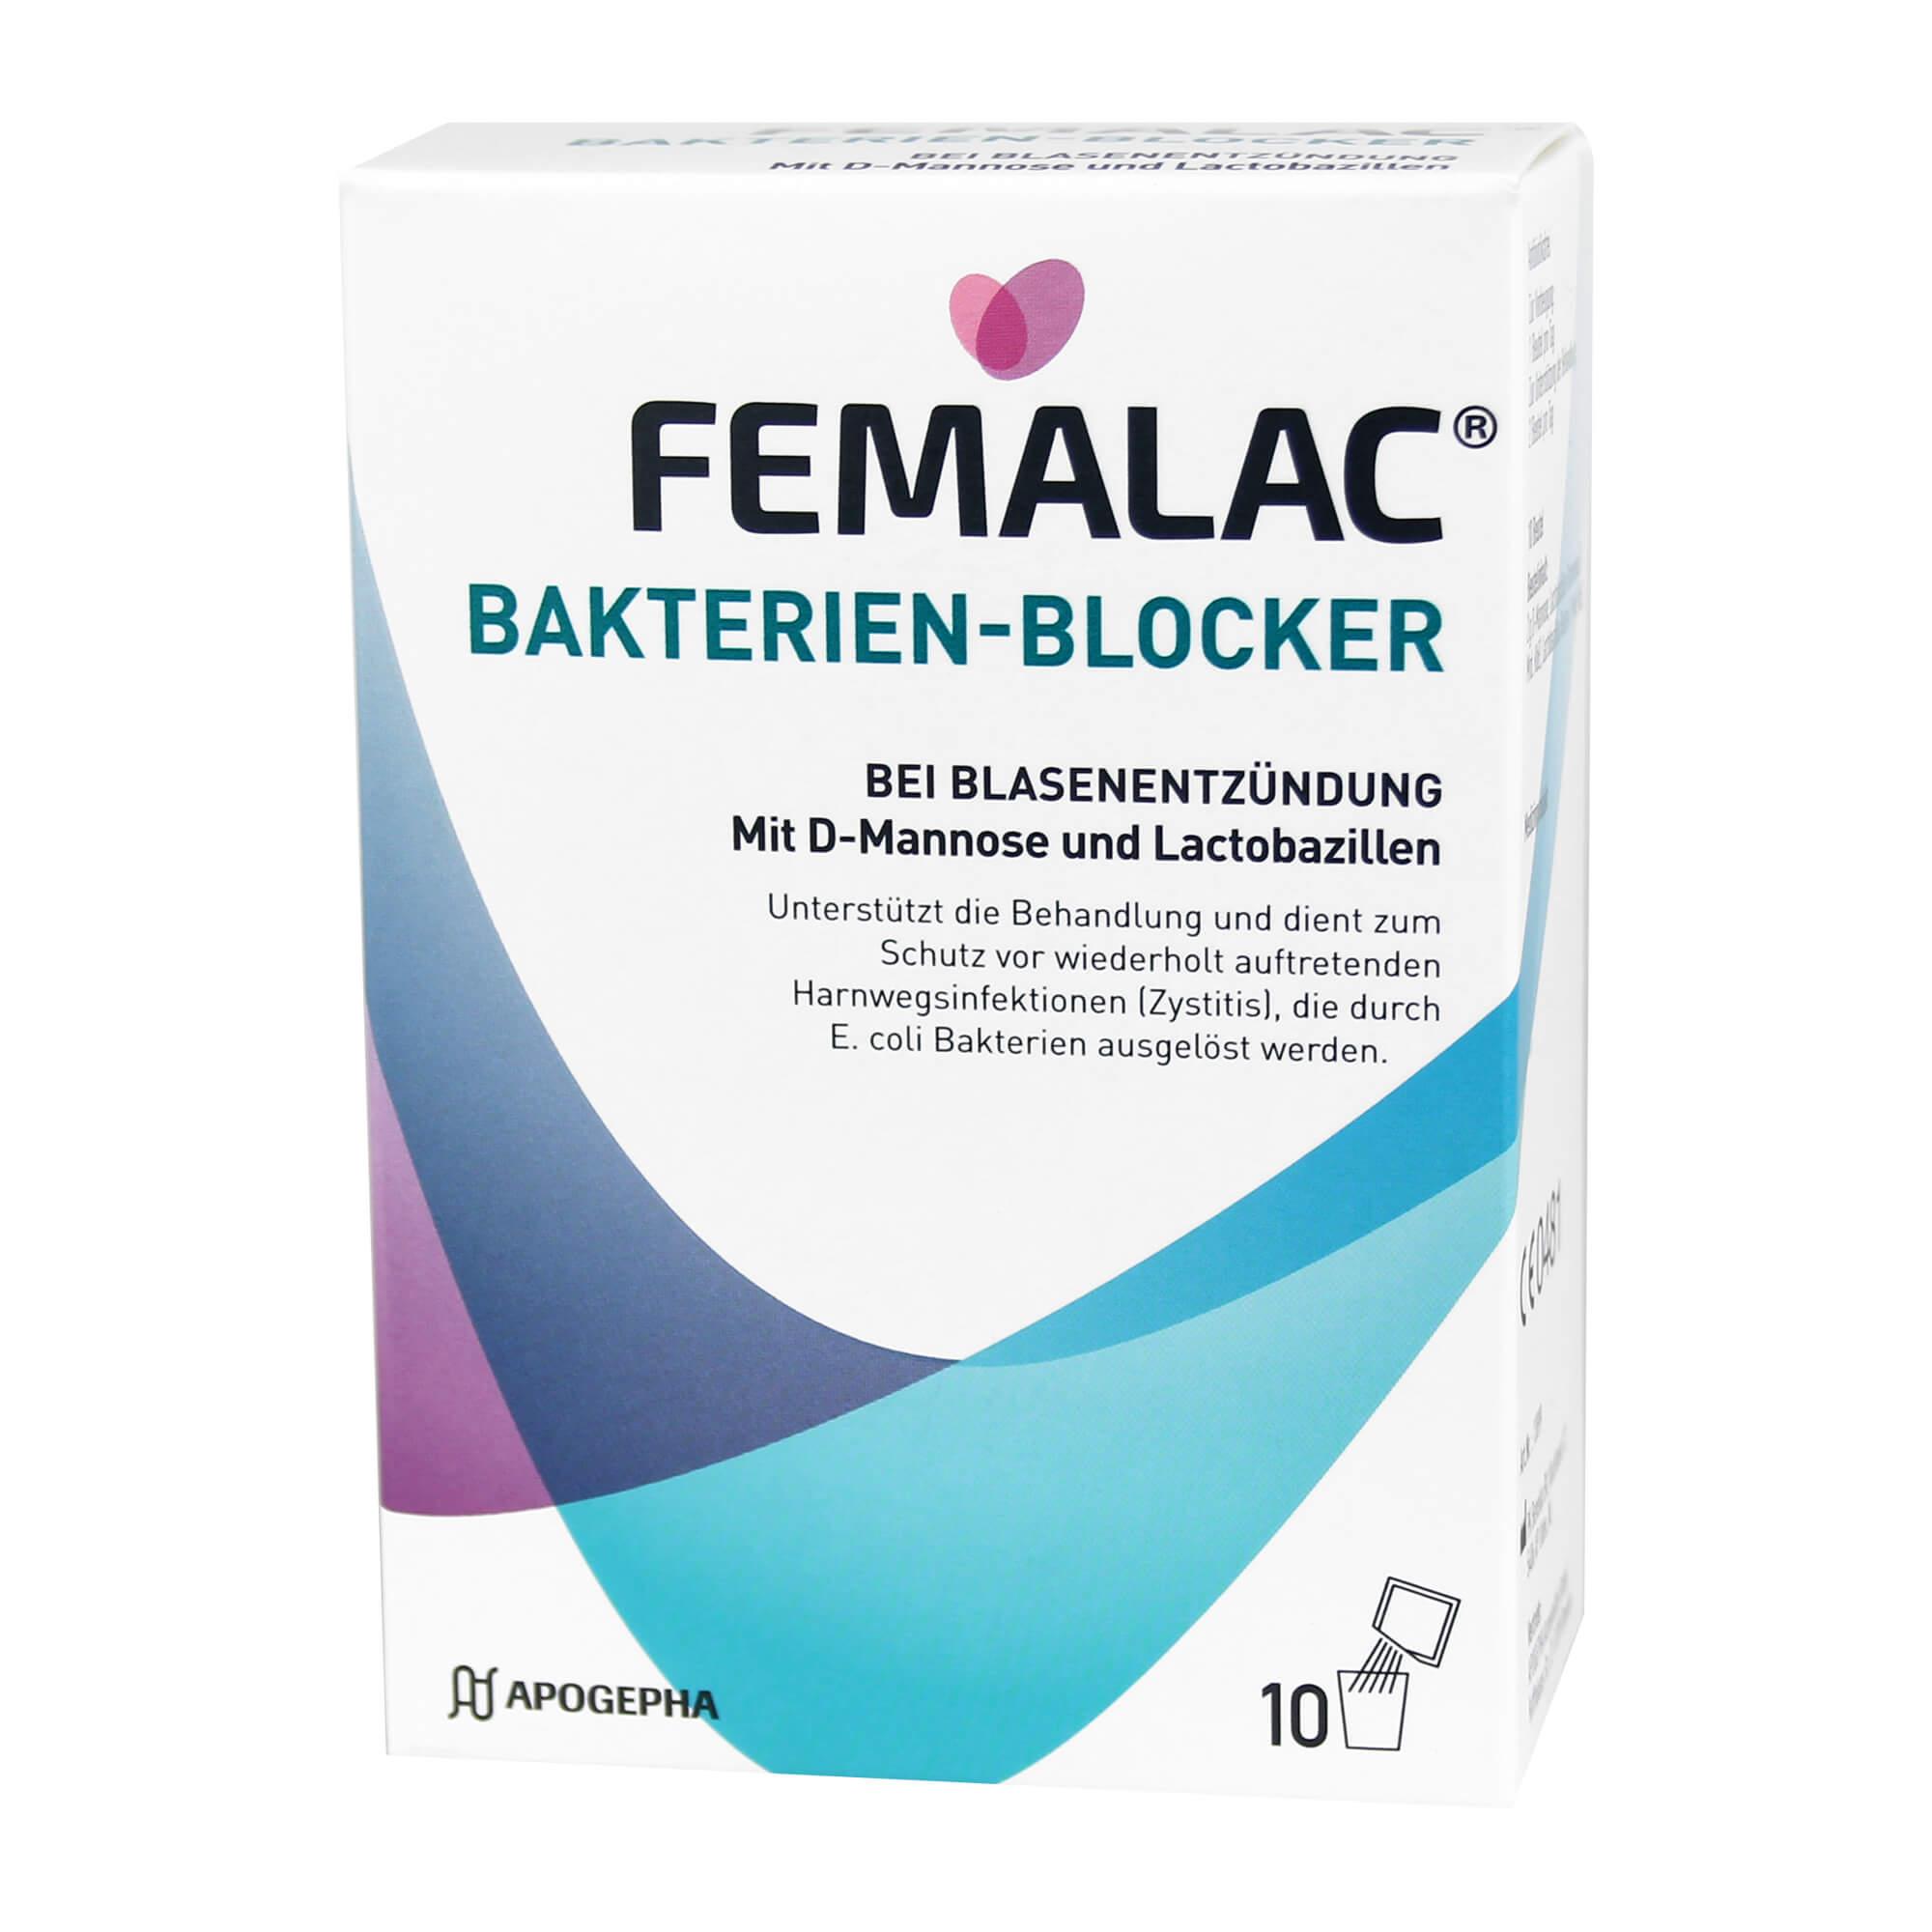 FEMALAC Bakterien-Blocker Beutel